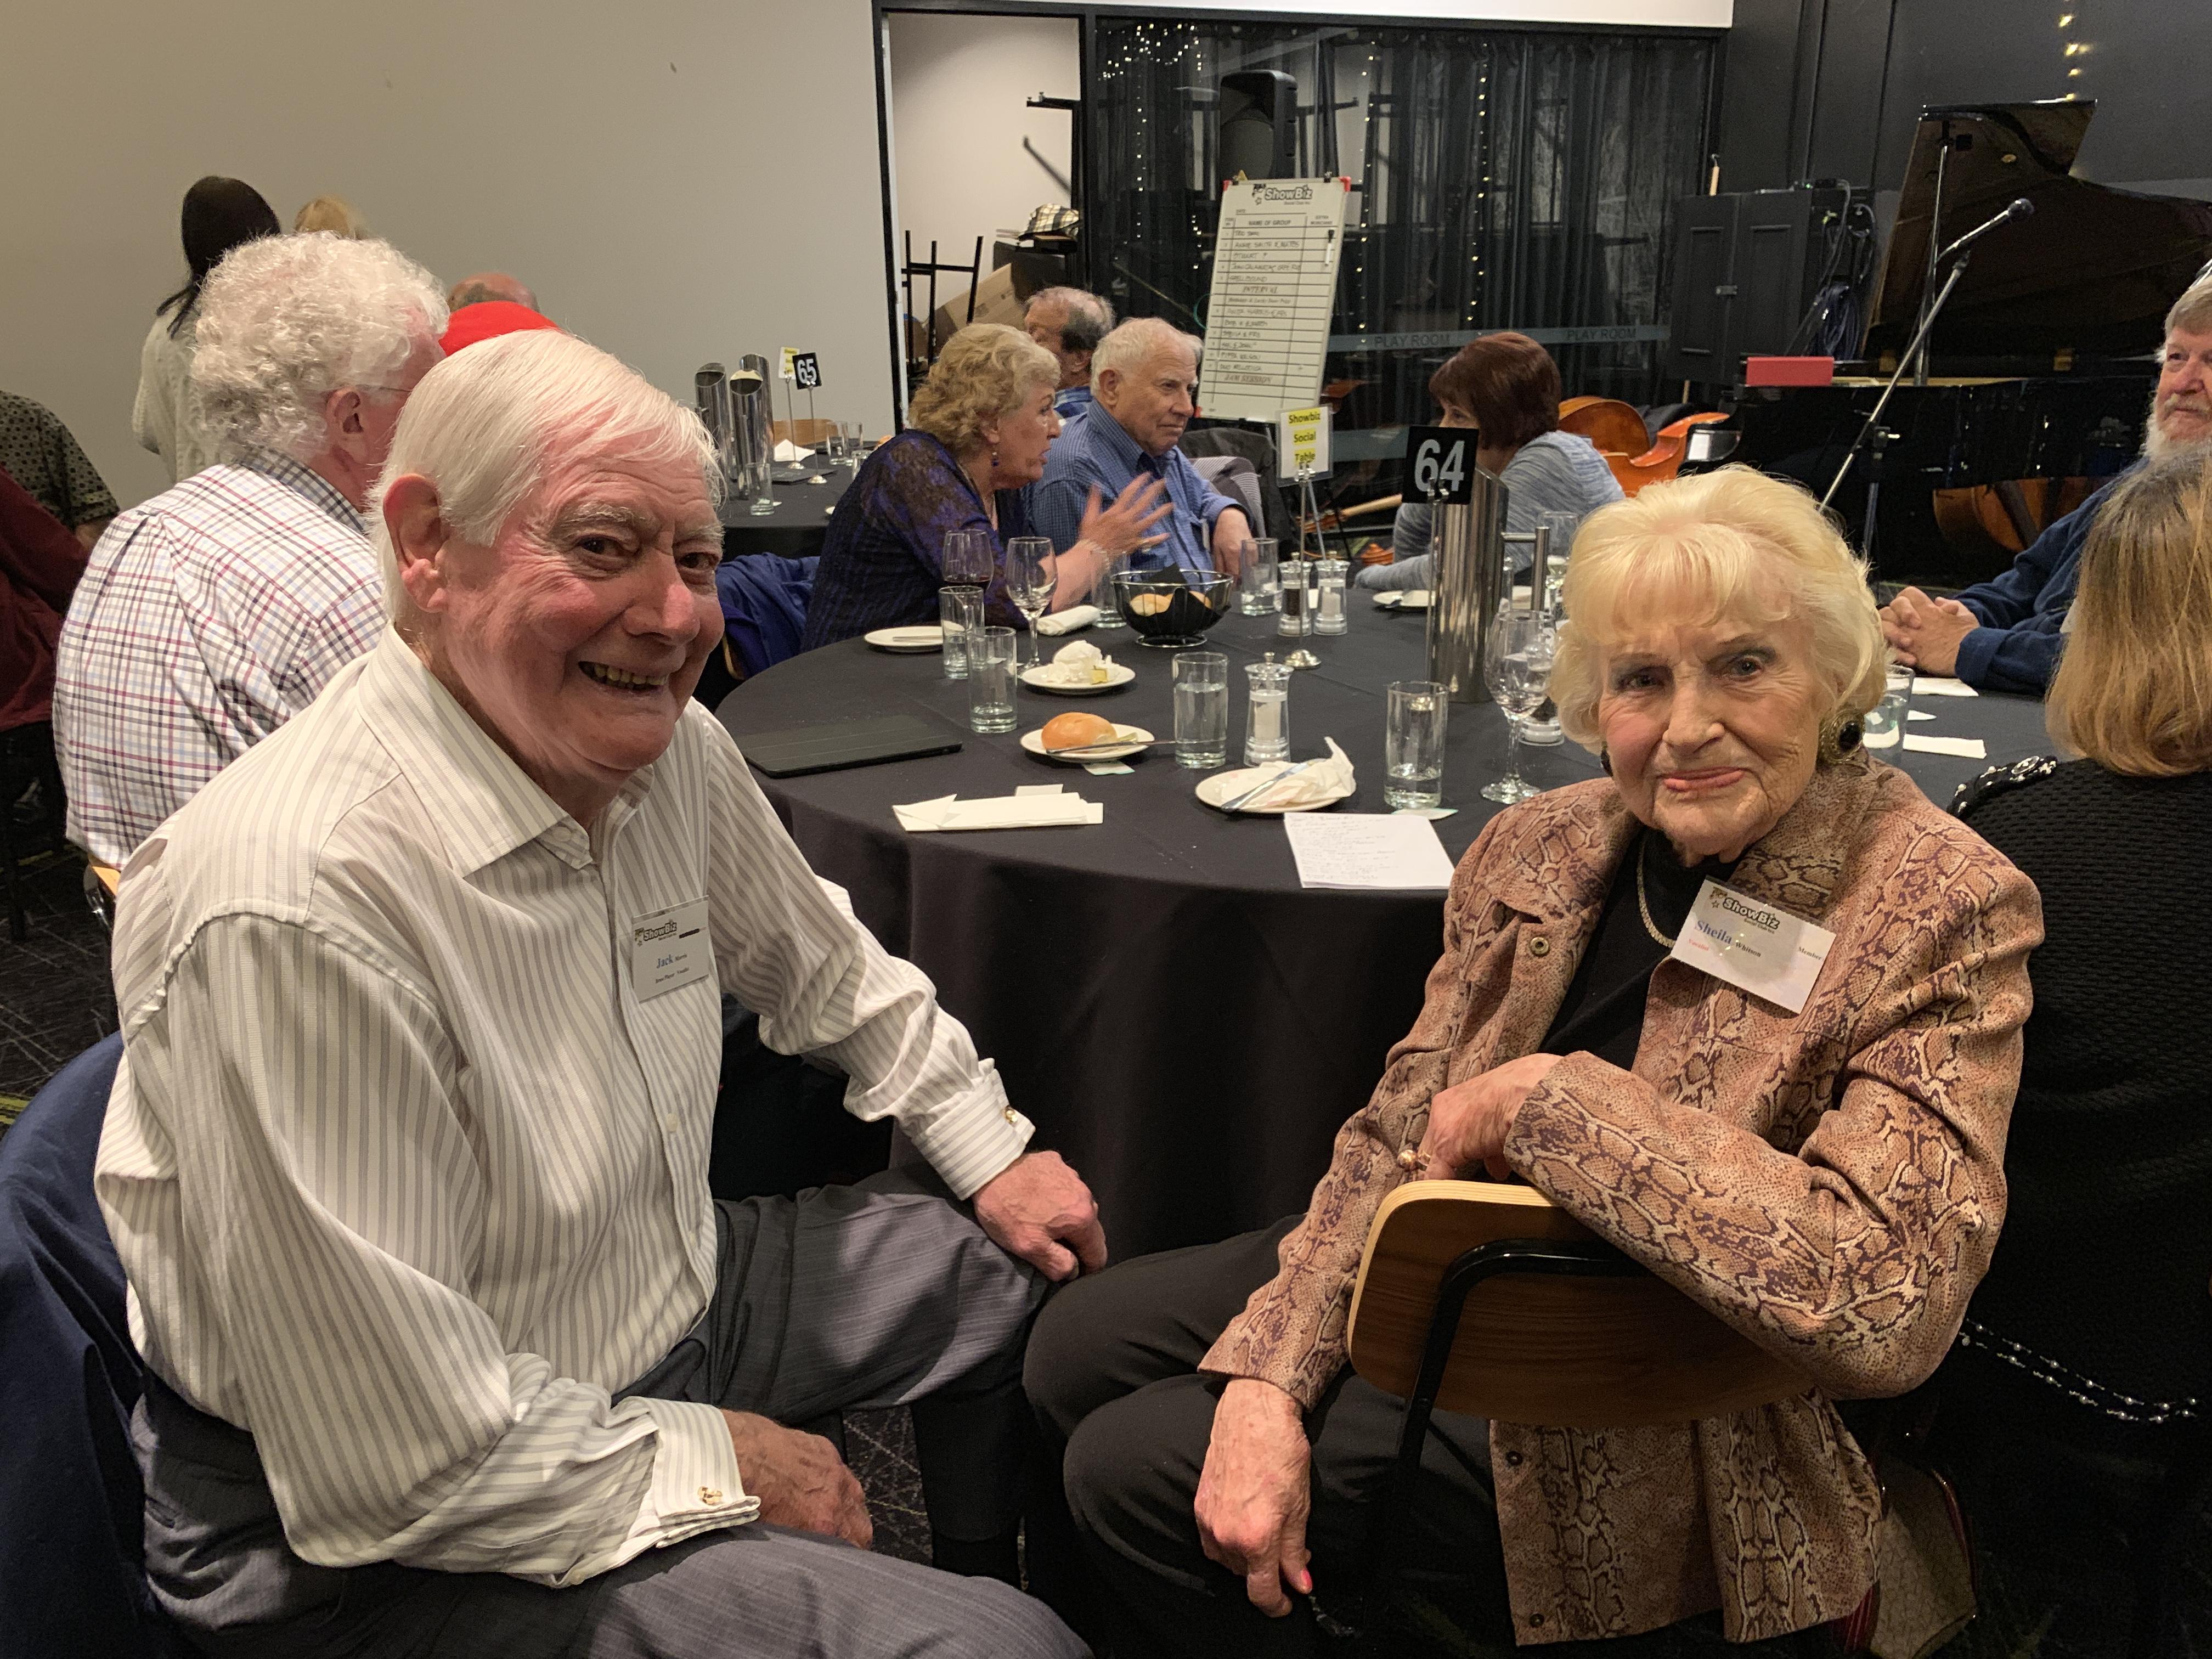 Jack and Sheila Apr 2019